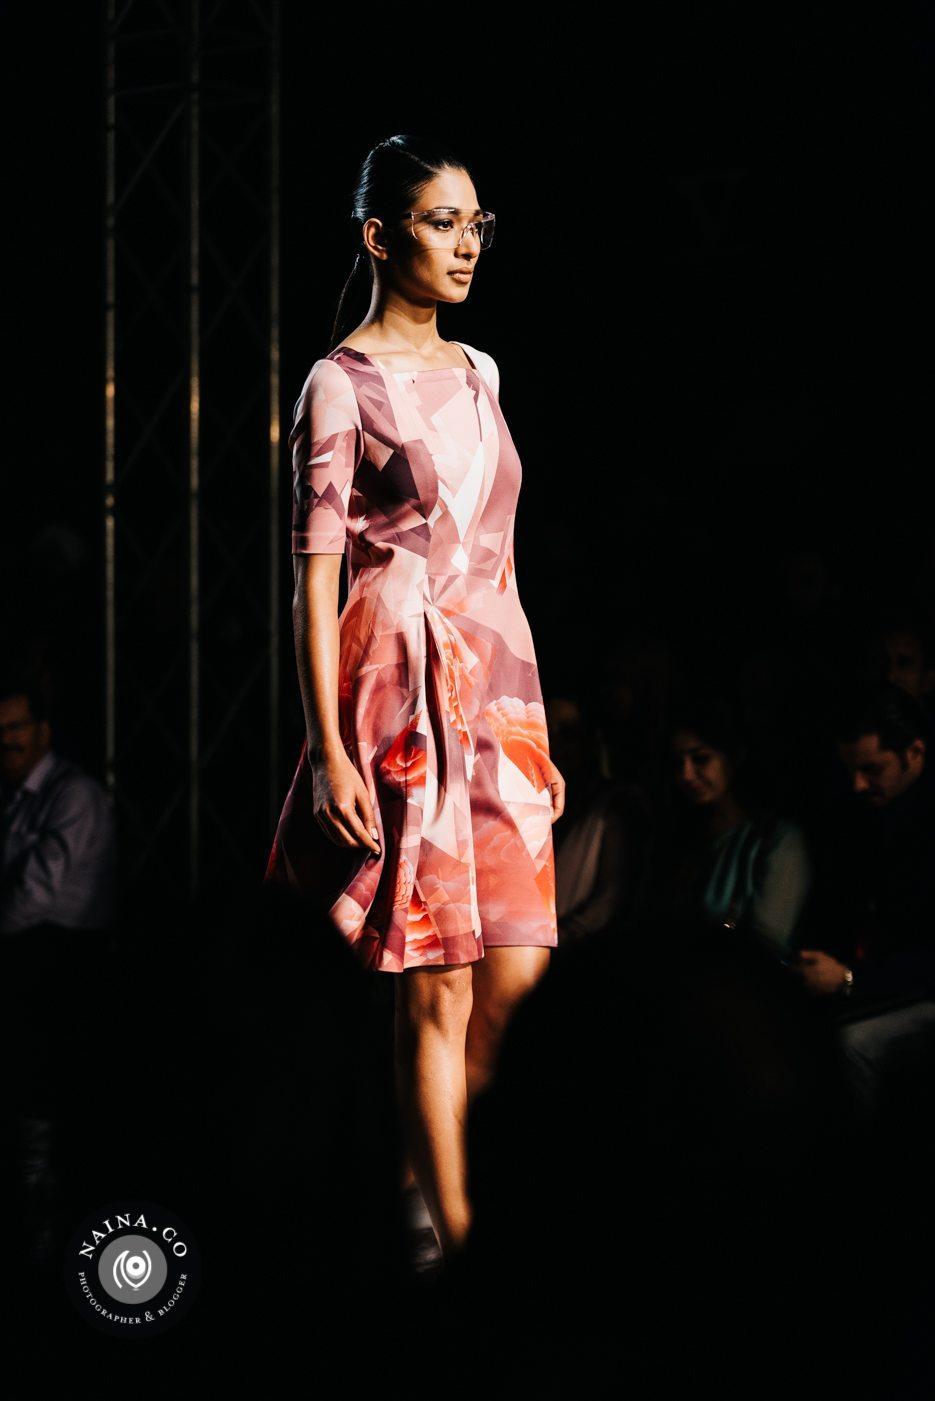 Naina.co-Raconteuse-Visuelle-Photographer-Blogger-Storyteller-Luxury-Lifestyle-AIFWAW15-Pankaj-Nidhi